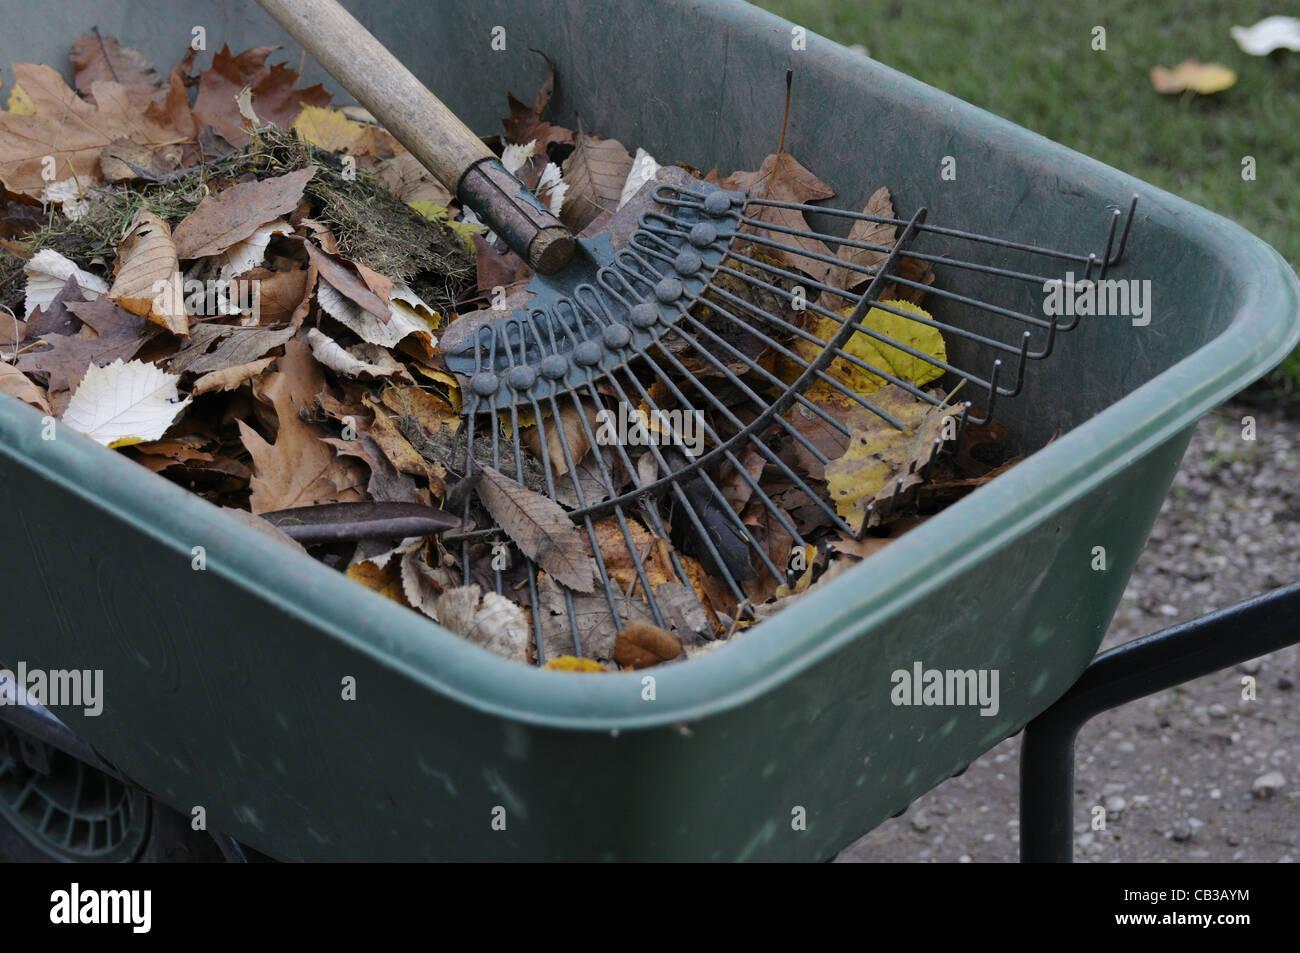 Wheelbarrow full of raked leaves with rake - Stock Image